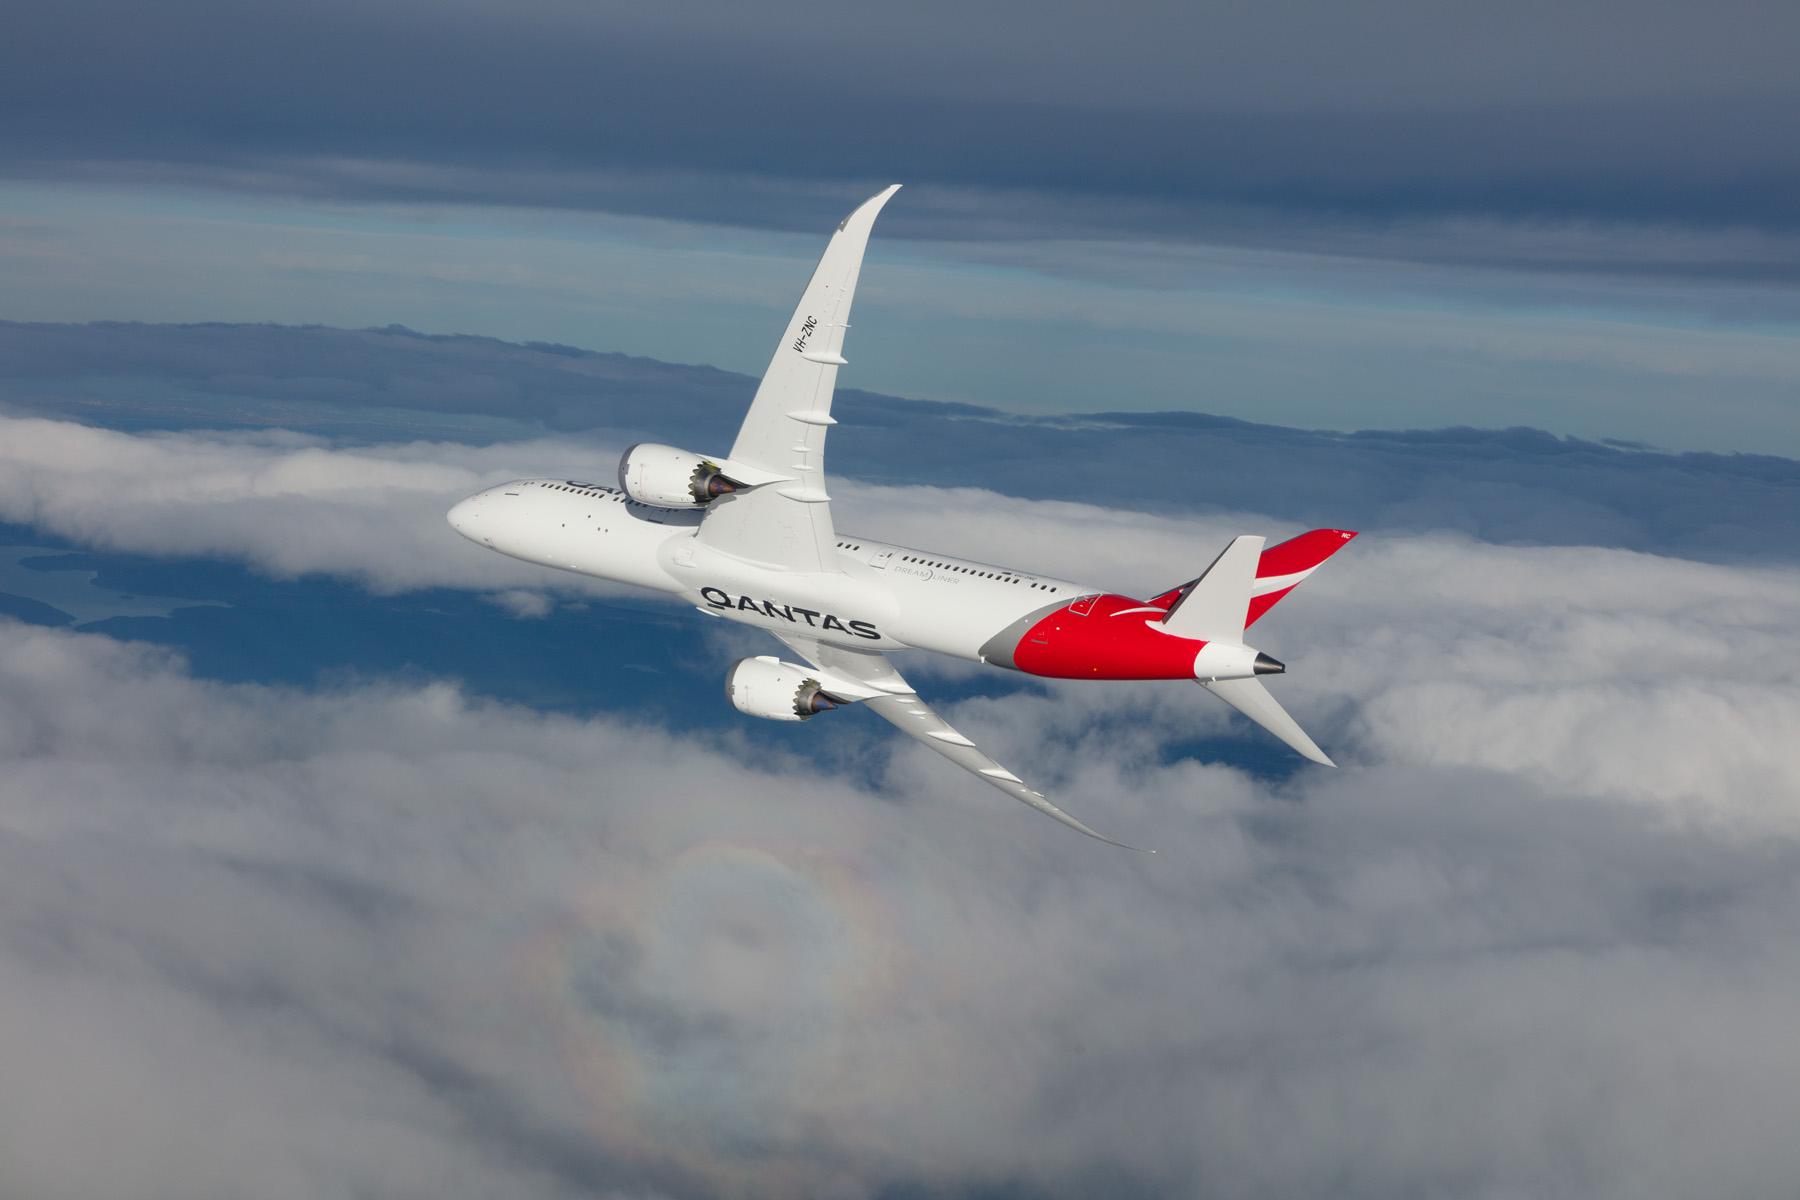 B787 Dreamliner de Qantas hará la ruta Santiago-Sídney